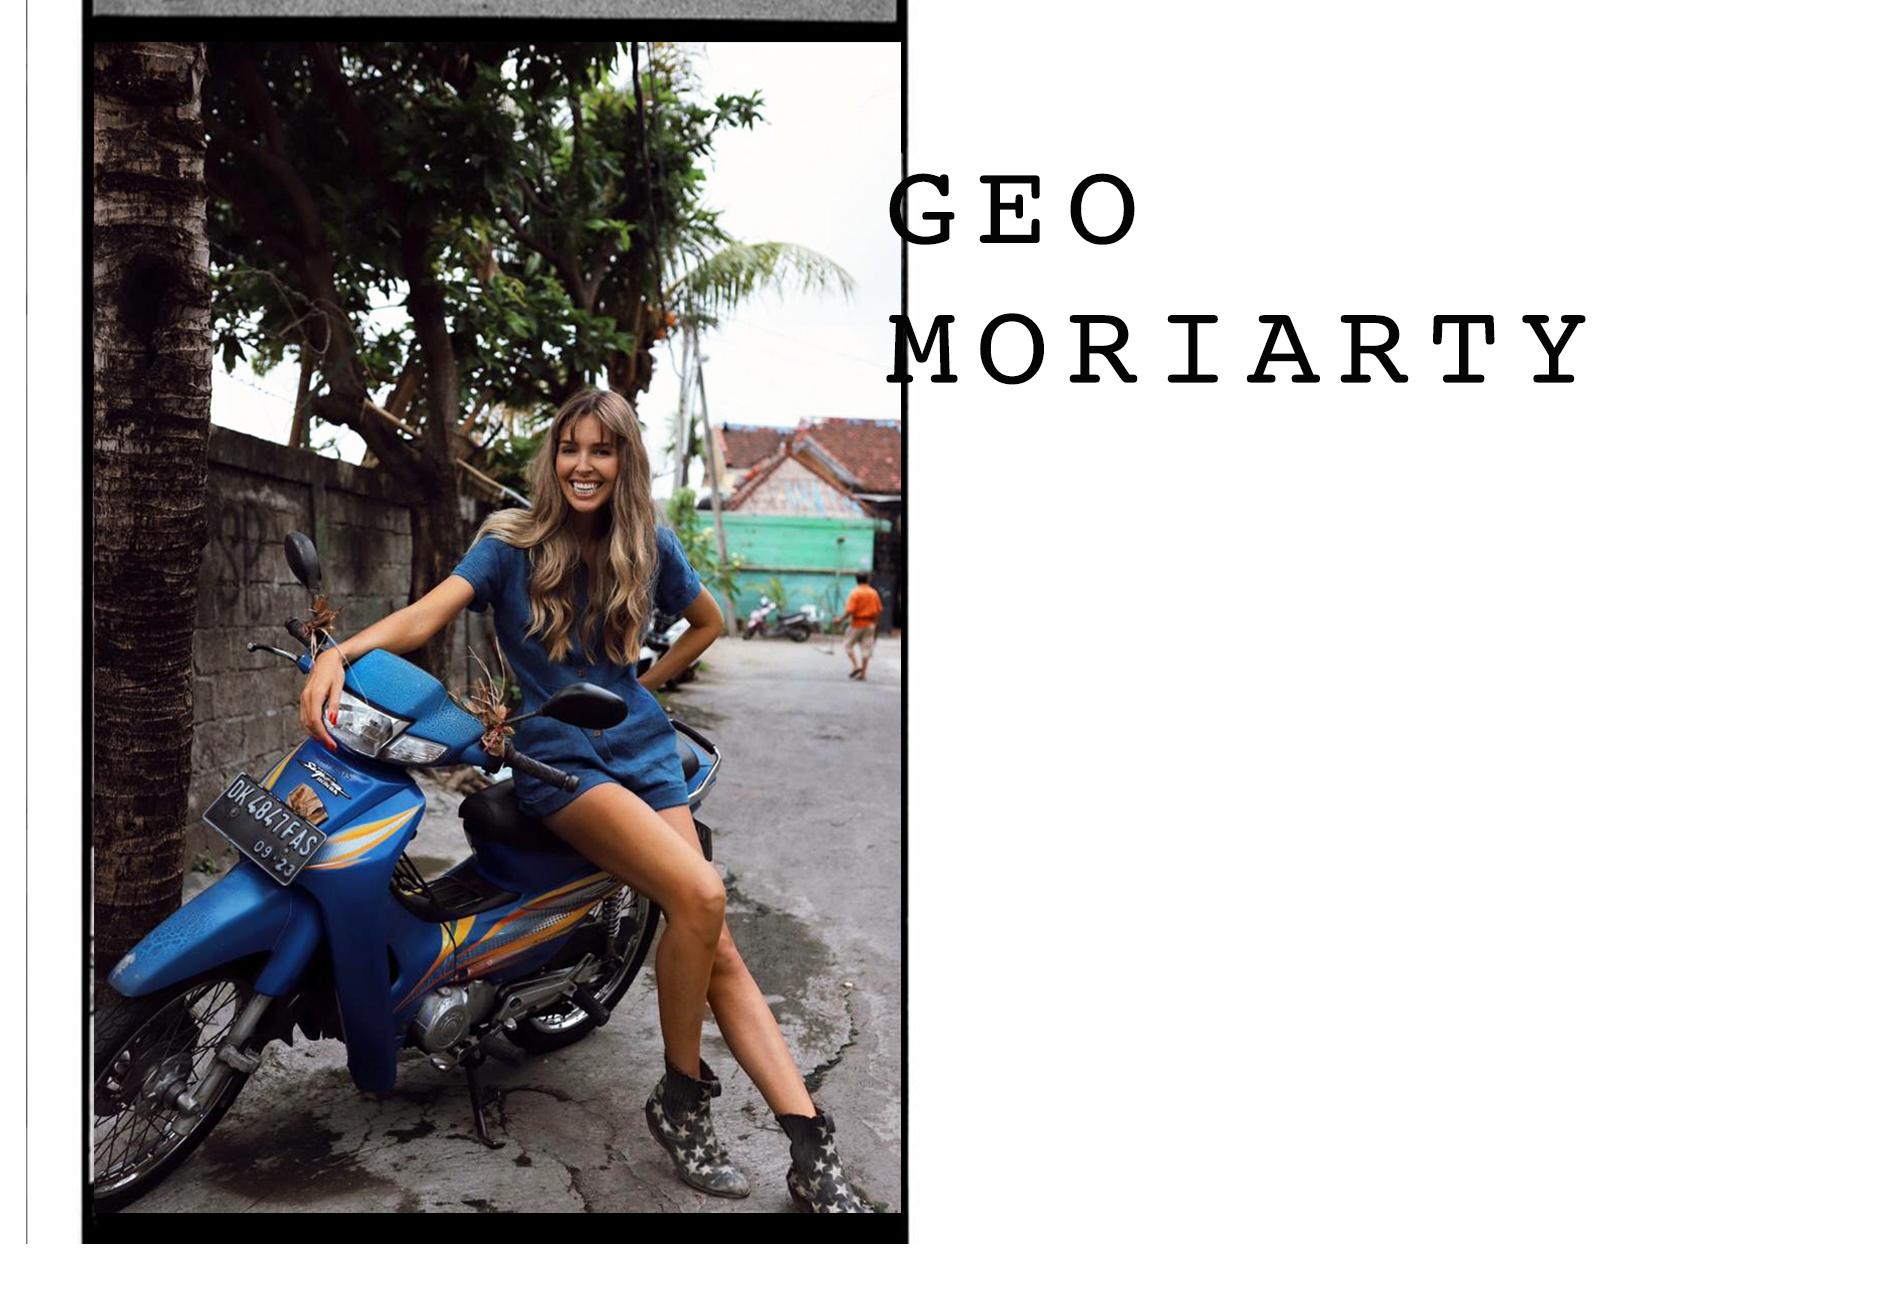 GEO MORIARTY